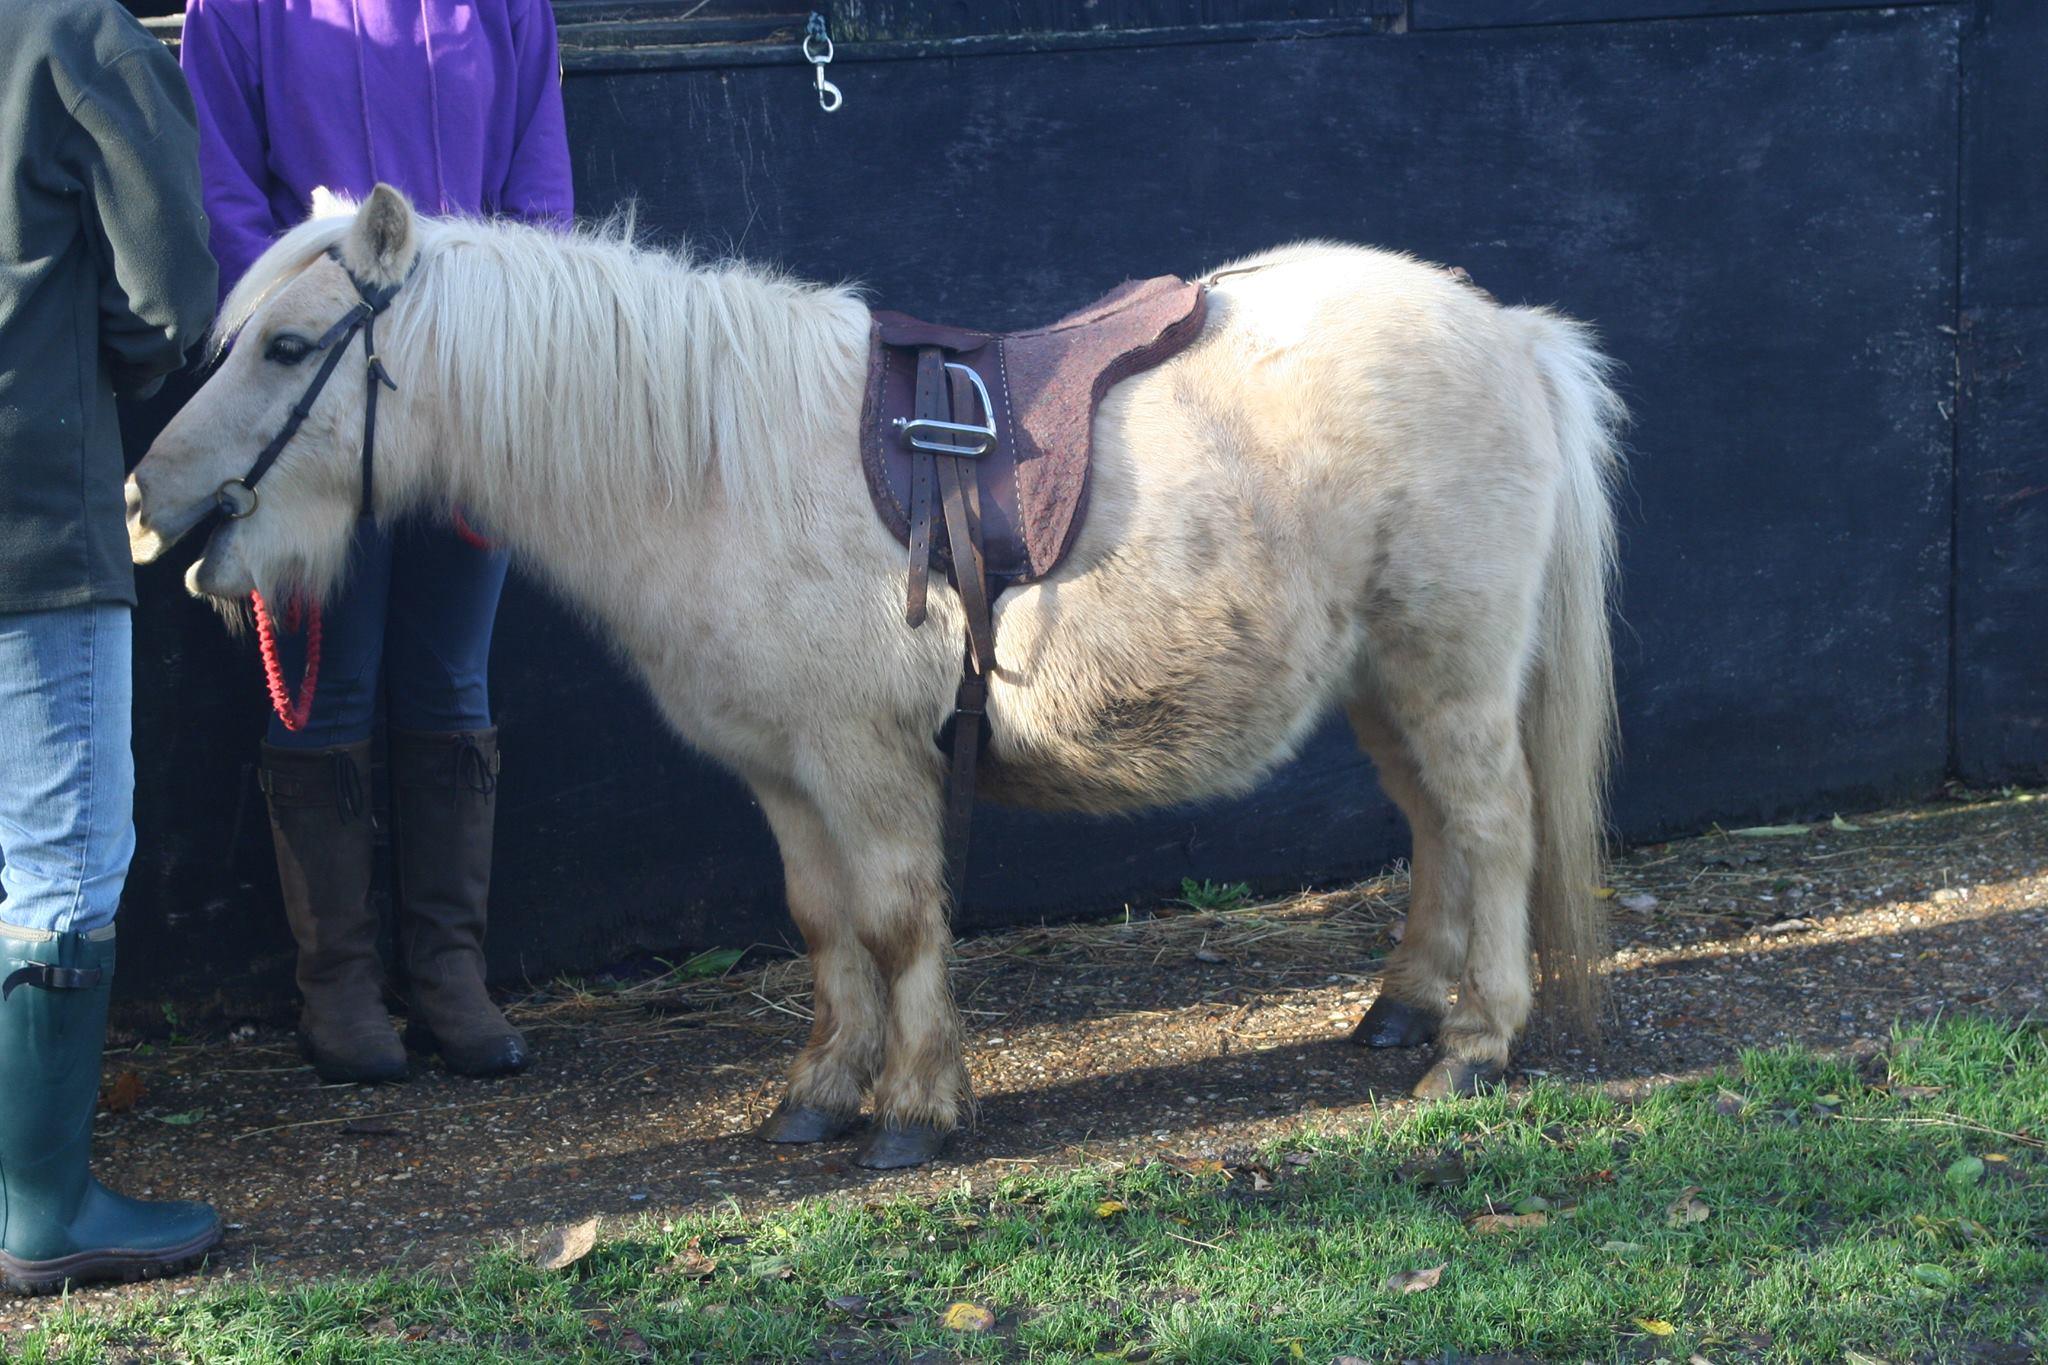 Pedro, American Miniature Pony at the Northcote Heavy Horse Centre, Lincolnshire